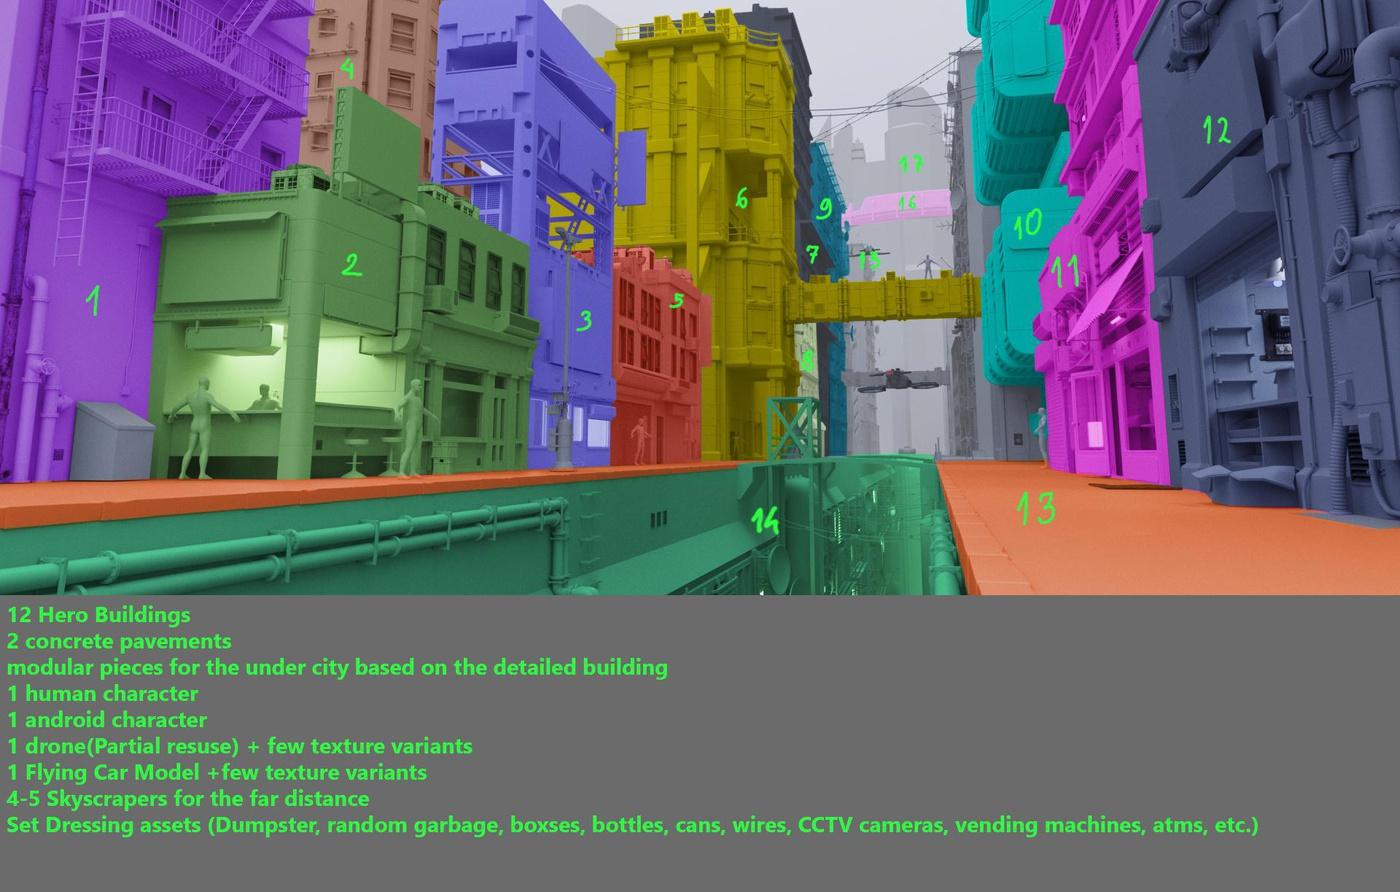 detailing blocking 3d model rendering modular pieces cityscape